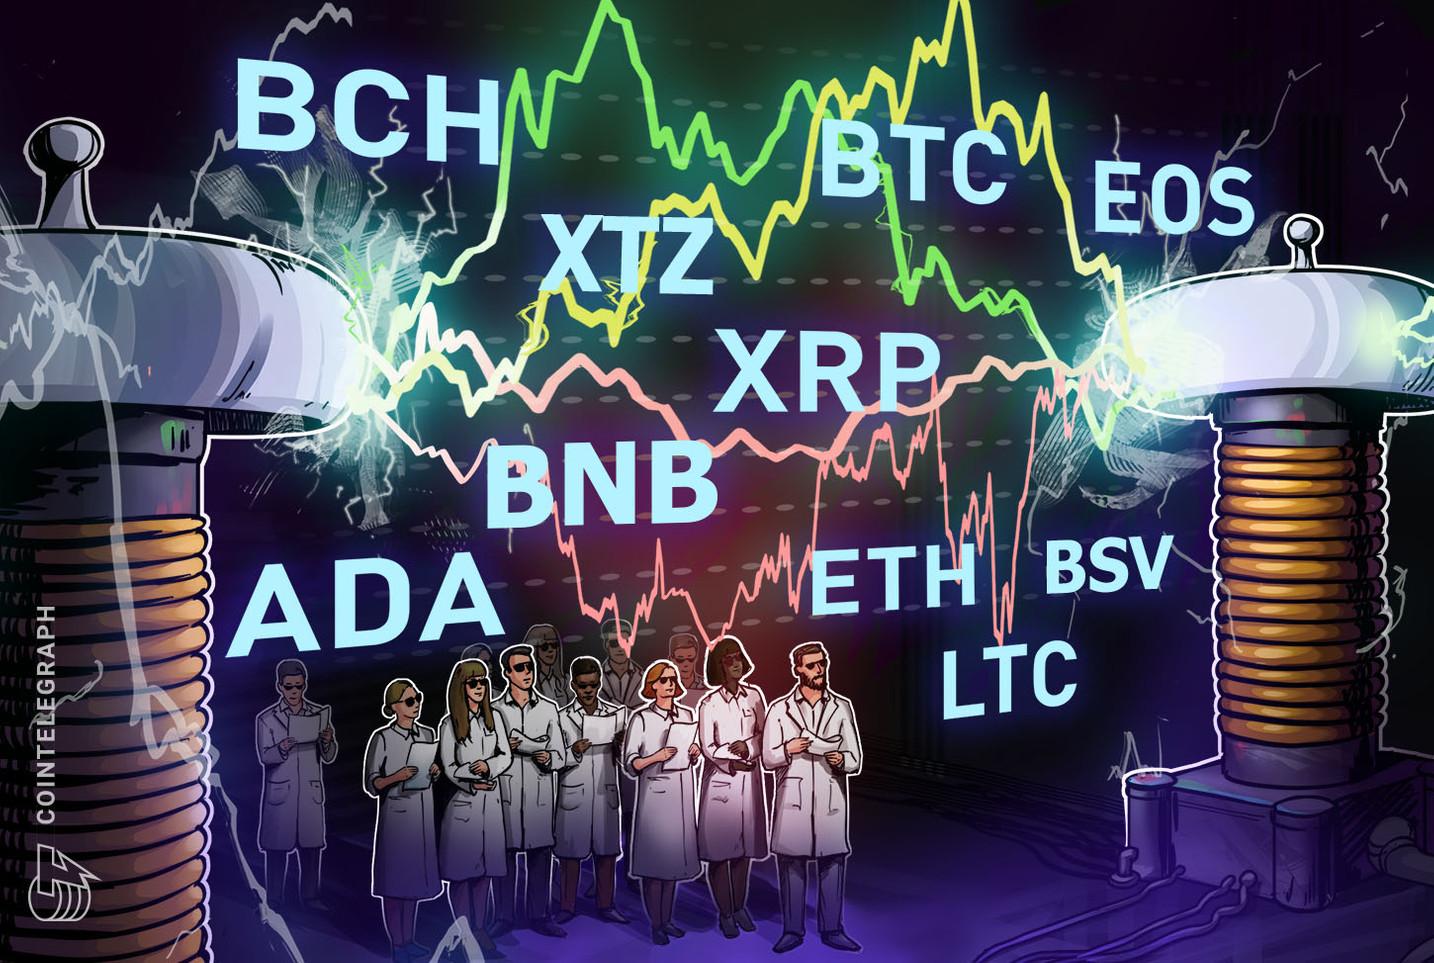 Análisis de precios del 10 de junio: BTC, ETH, XRP, BCH, BSV, LTC, BNB, EOS, ADA, XTZ